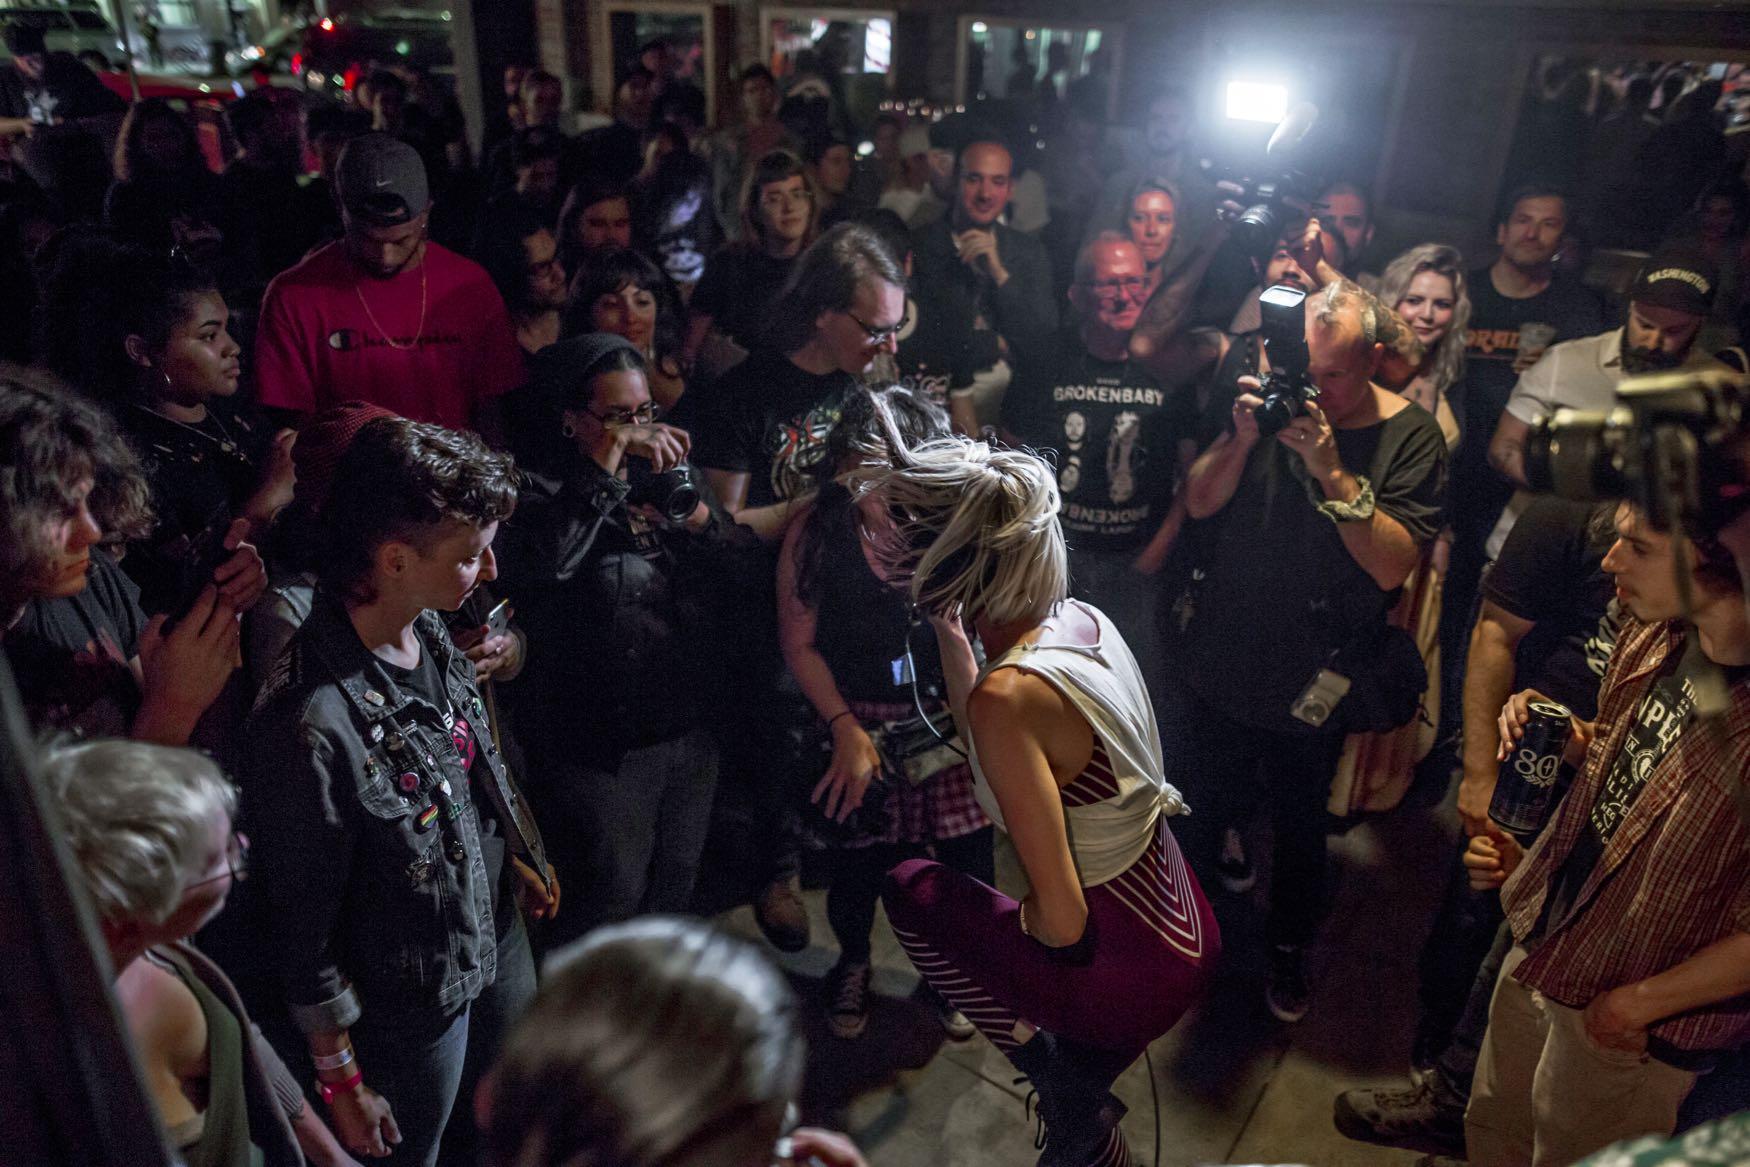 Broken Baby for Bands In A Barbershop @ Echo Park Rising 8/15/19. Photo by Derrick K. Lee, Esq. (@Methodman13) for www.BlurredCulture.com.